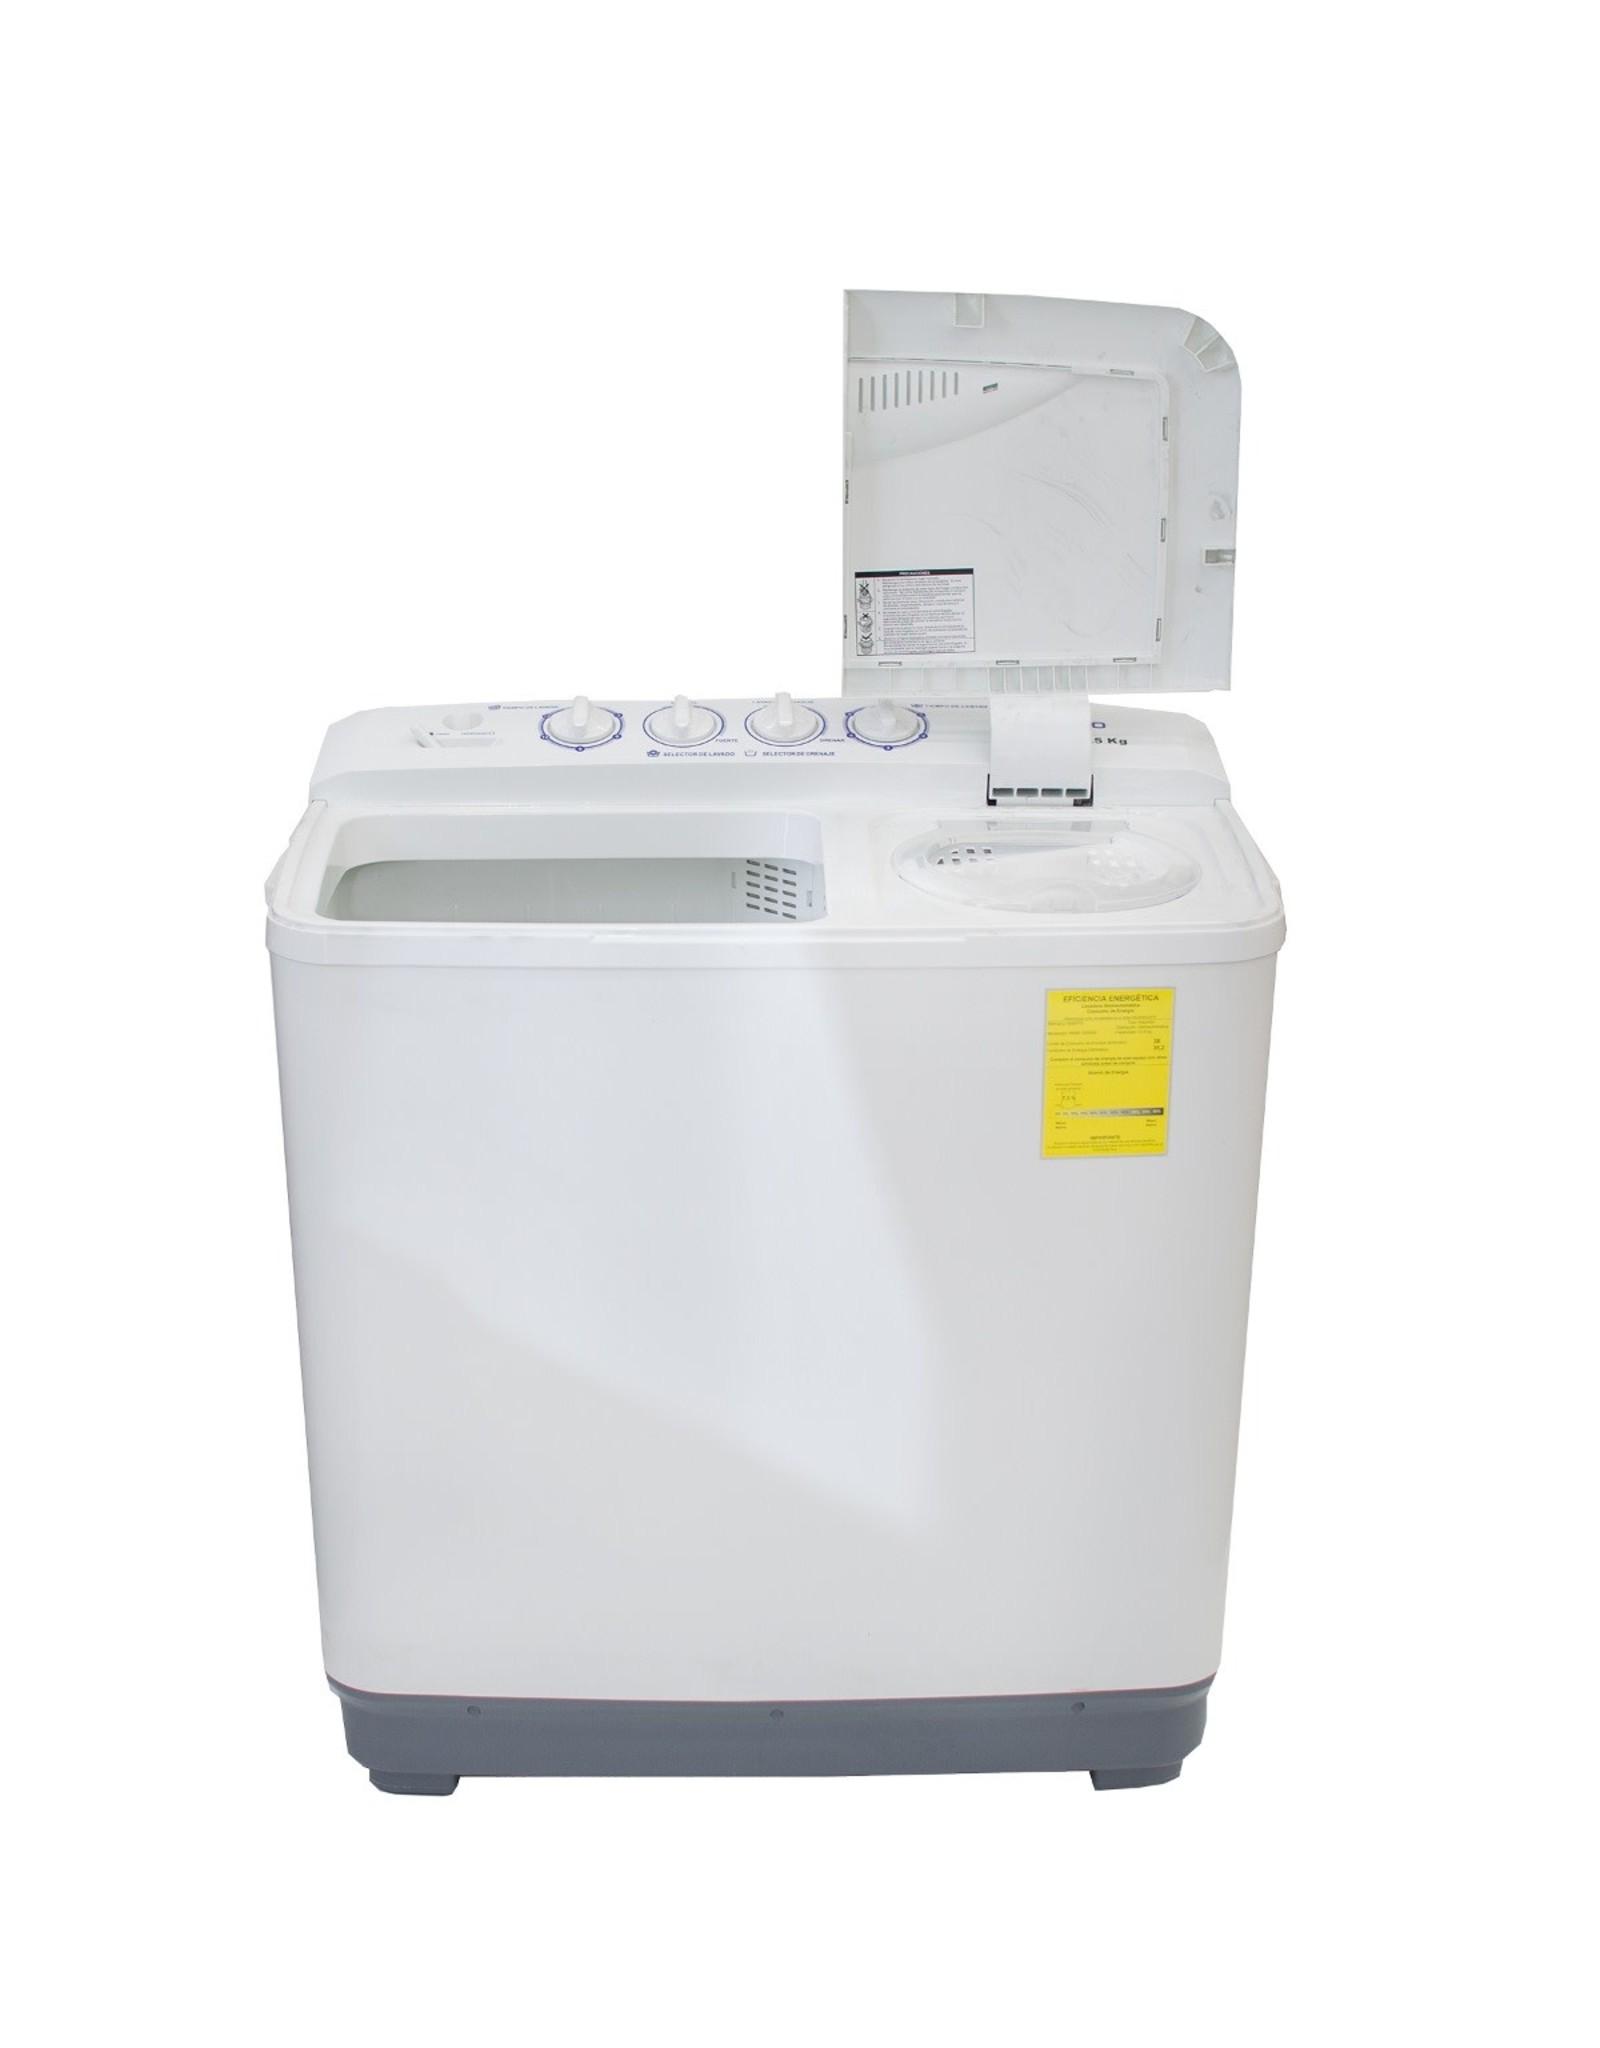 Nisato Nisato Washing Machine 14kg White NWM-1400MD